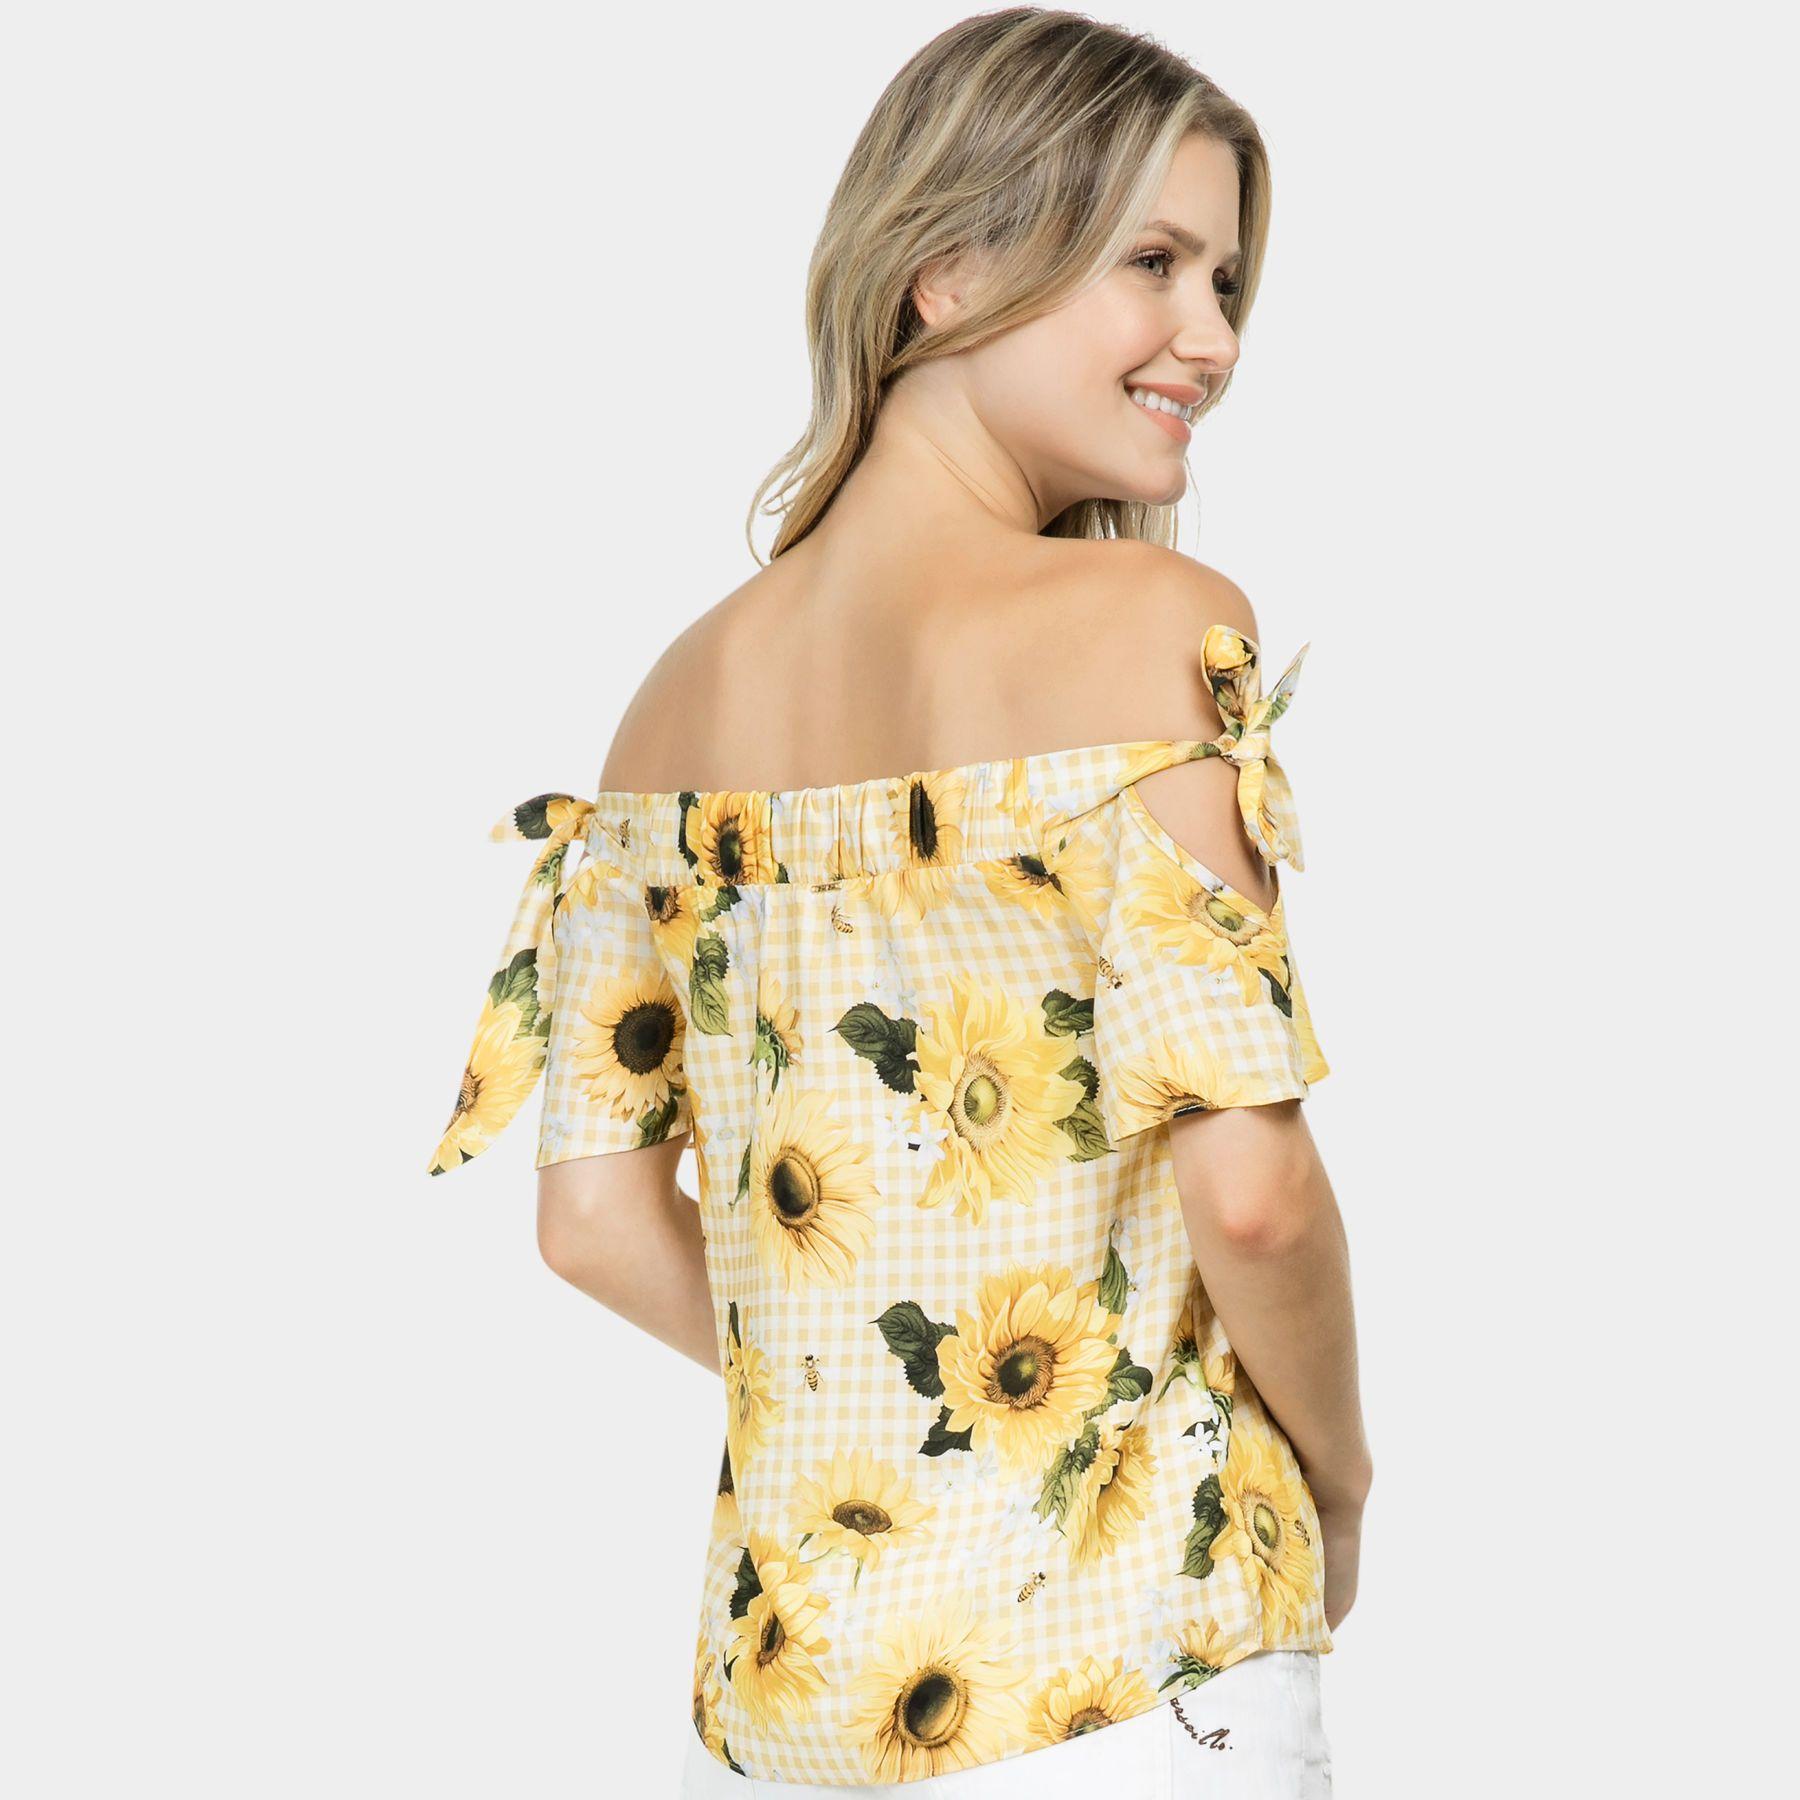 7750a4922 Blusa Ombro a Ombro Laço Tecido Tournesol - Lez a Lez | vestido 2018 ...